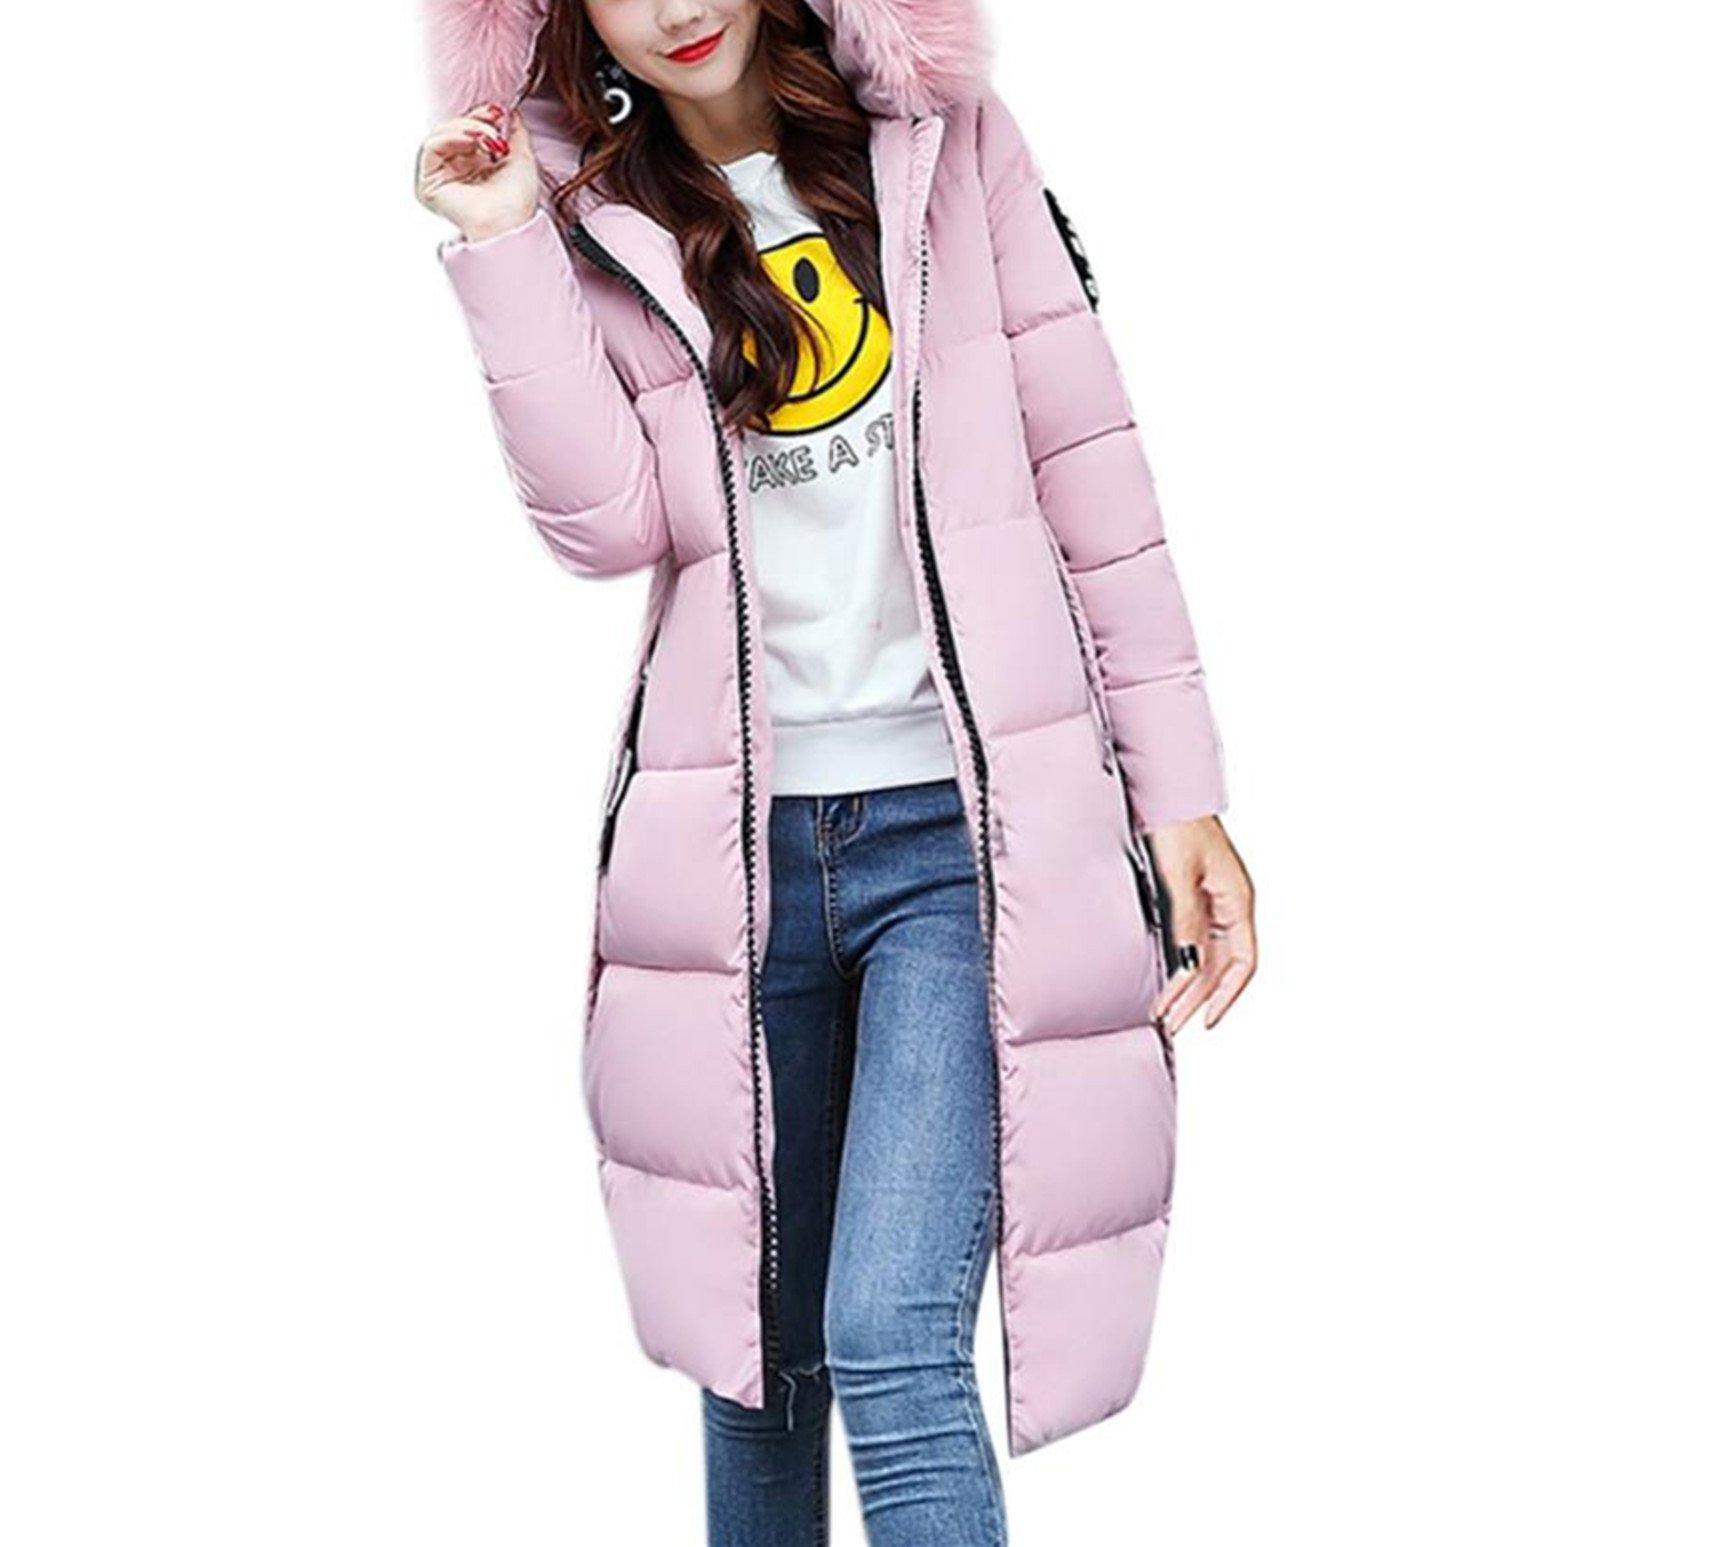 BSGSH Women's Down Coat with Faux Fur Hood Long Warm Down Parka Puffer Jacket (Pink, M)